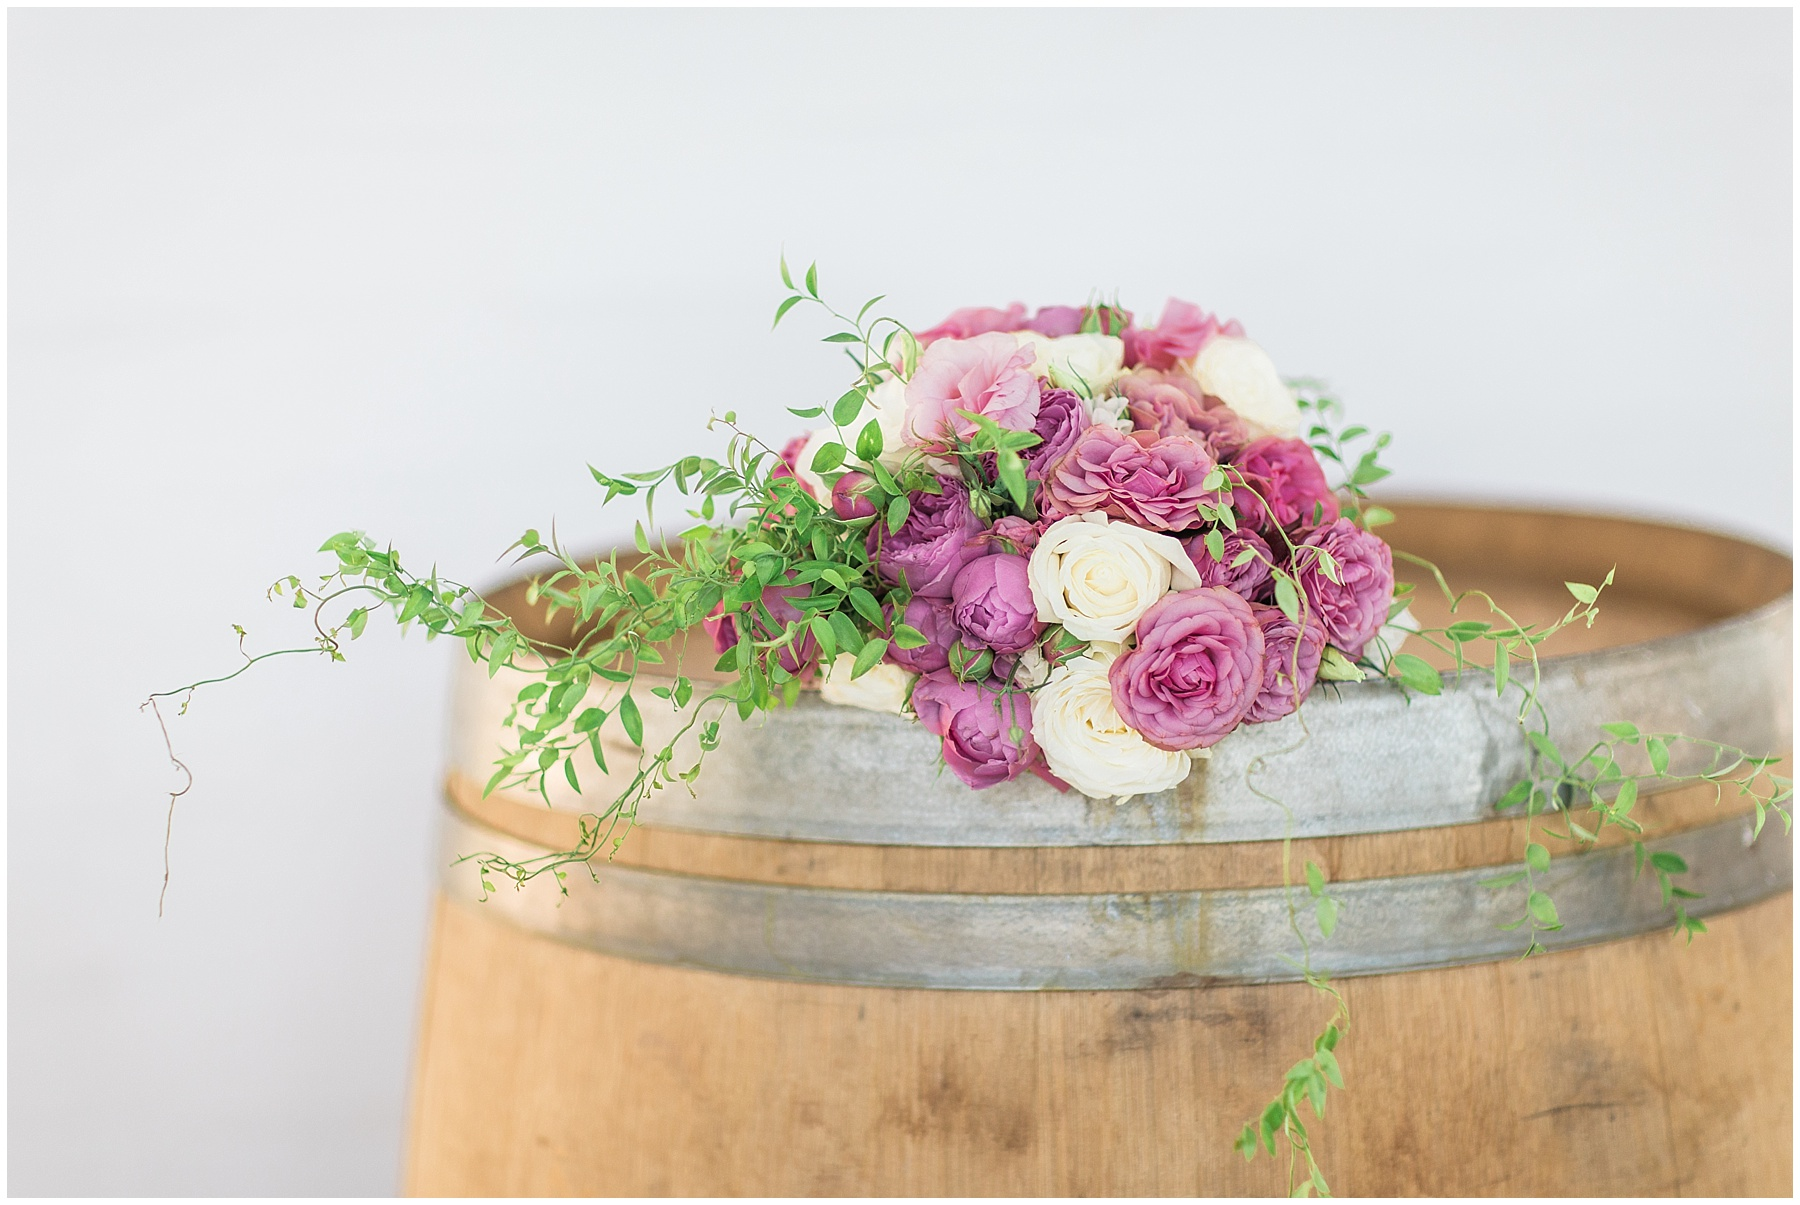 AliciaLandman_JoleneandZander_Wedding_The Pretty Blog_0398.jpg